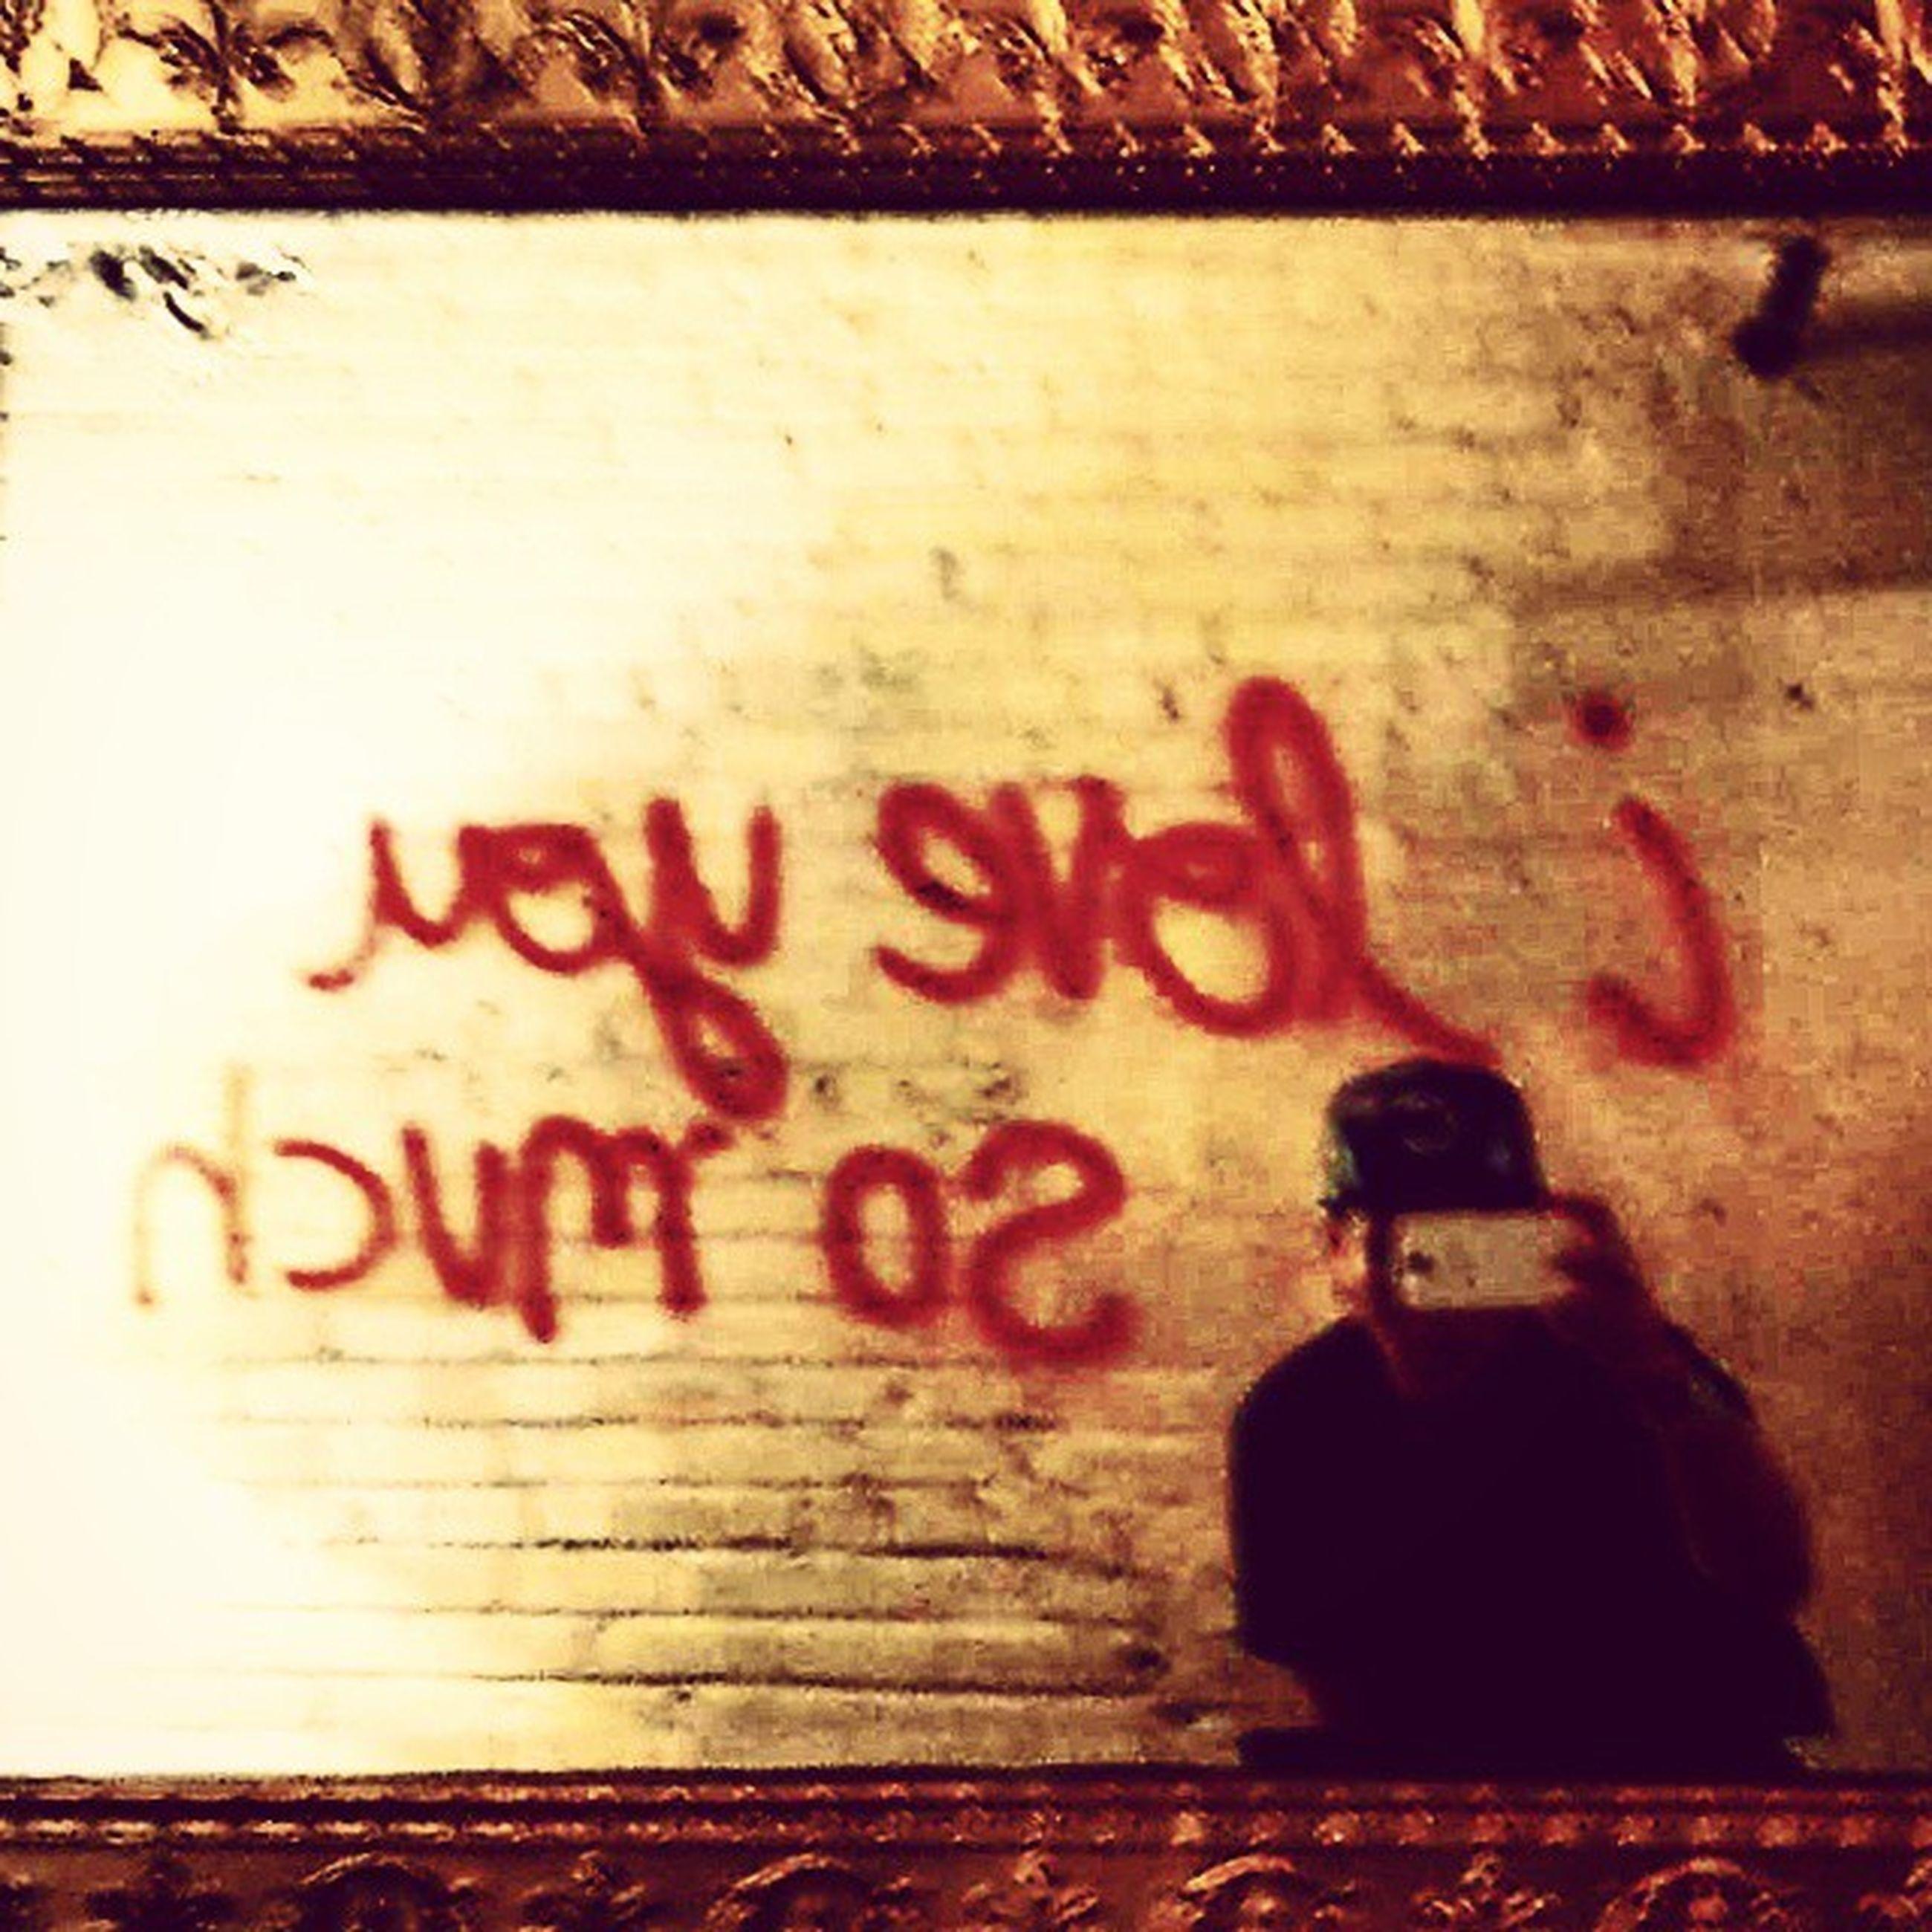 I love you so much. Denver Punchbowlsocial Graffiti | EyeEm